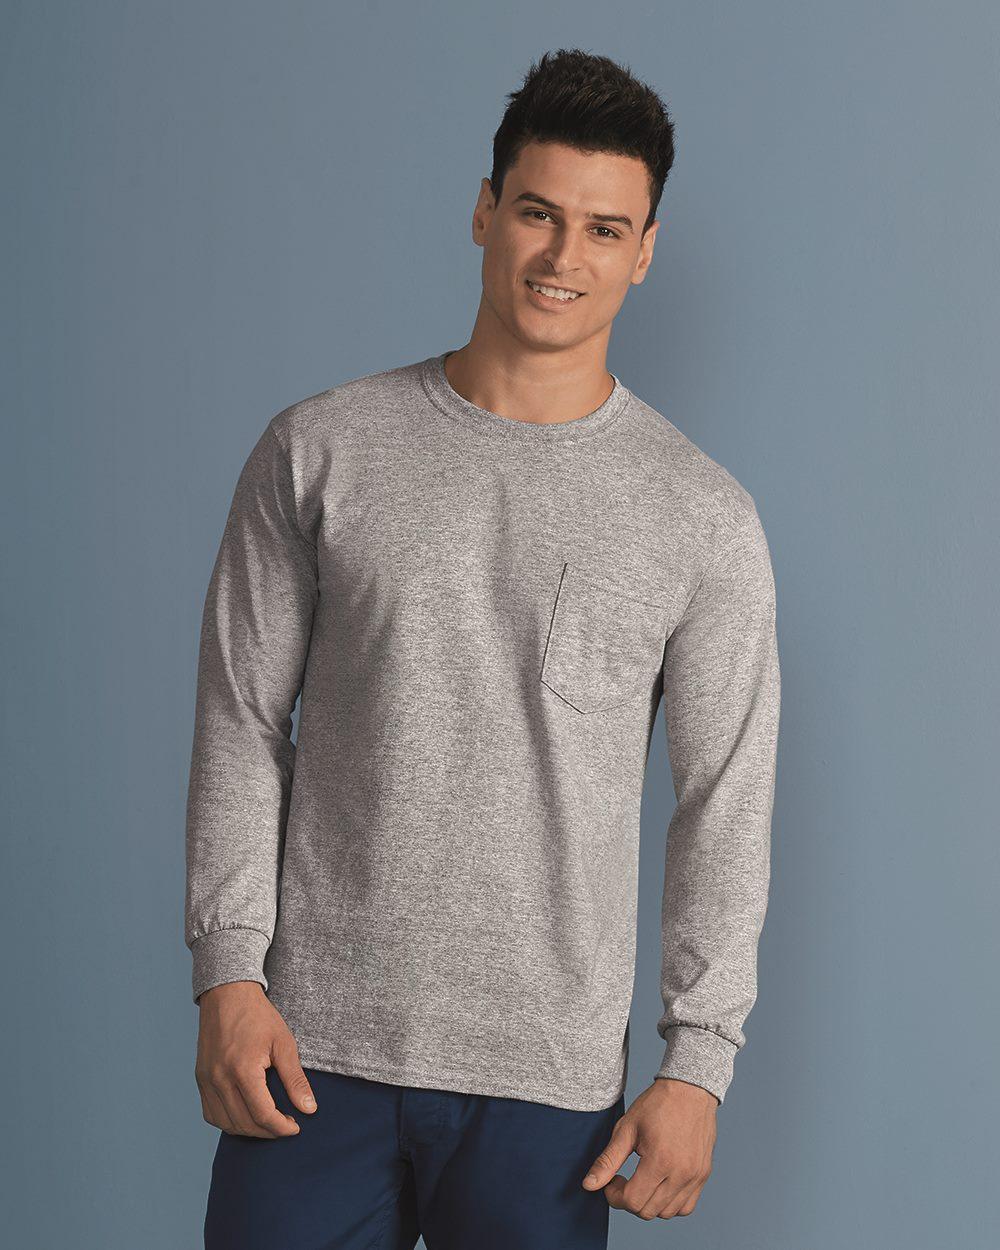 39e09385876 Gildan 2410 - Ultra Cotton Long Sleeve T-Shirt with a Pocket ...